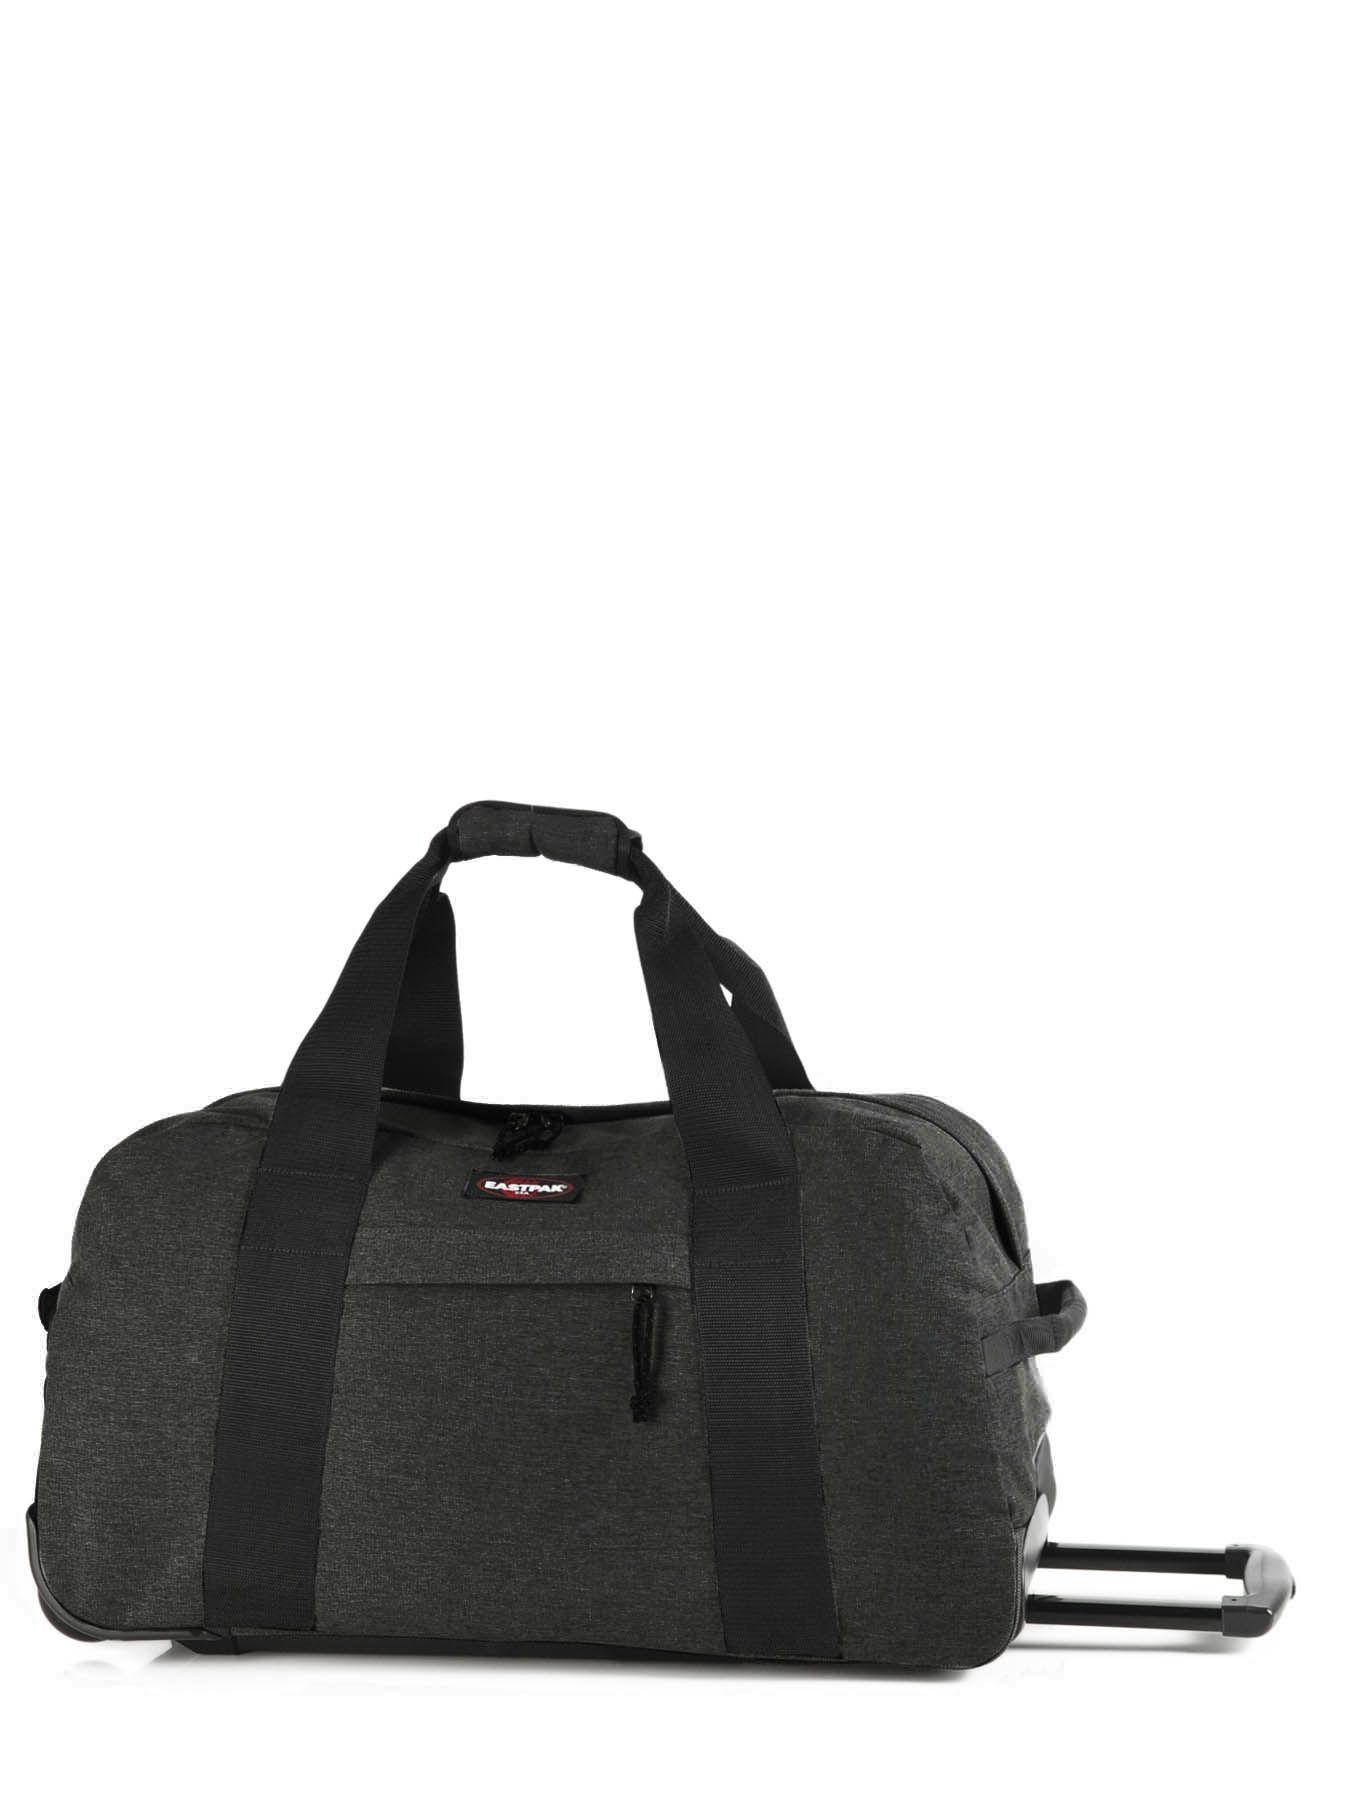 sac de voyage eastpak authentic luggage authentic luggage sur. Black Bedroom Furniture Sets. Home Design Ideas